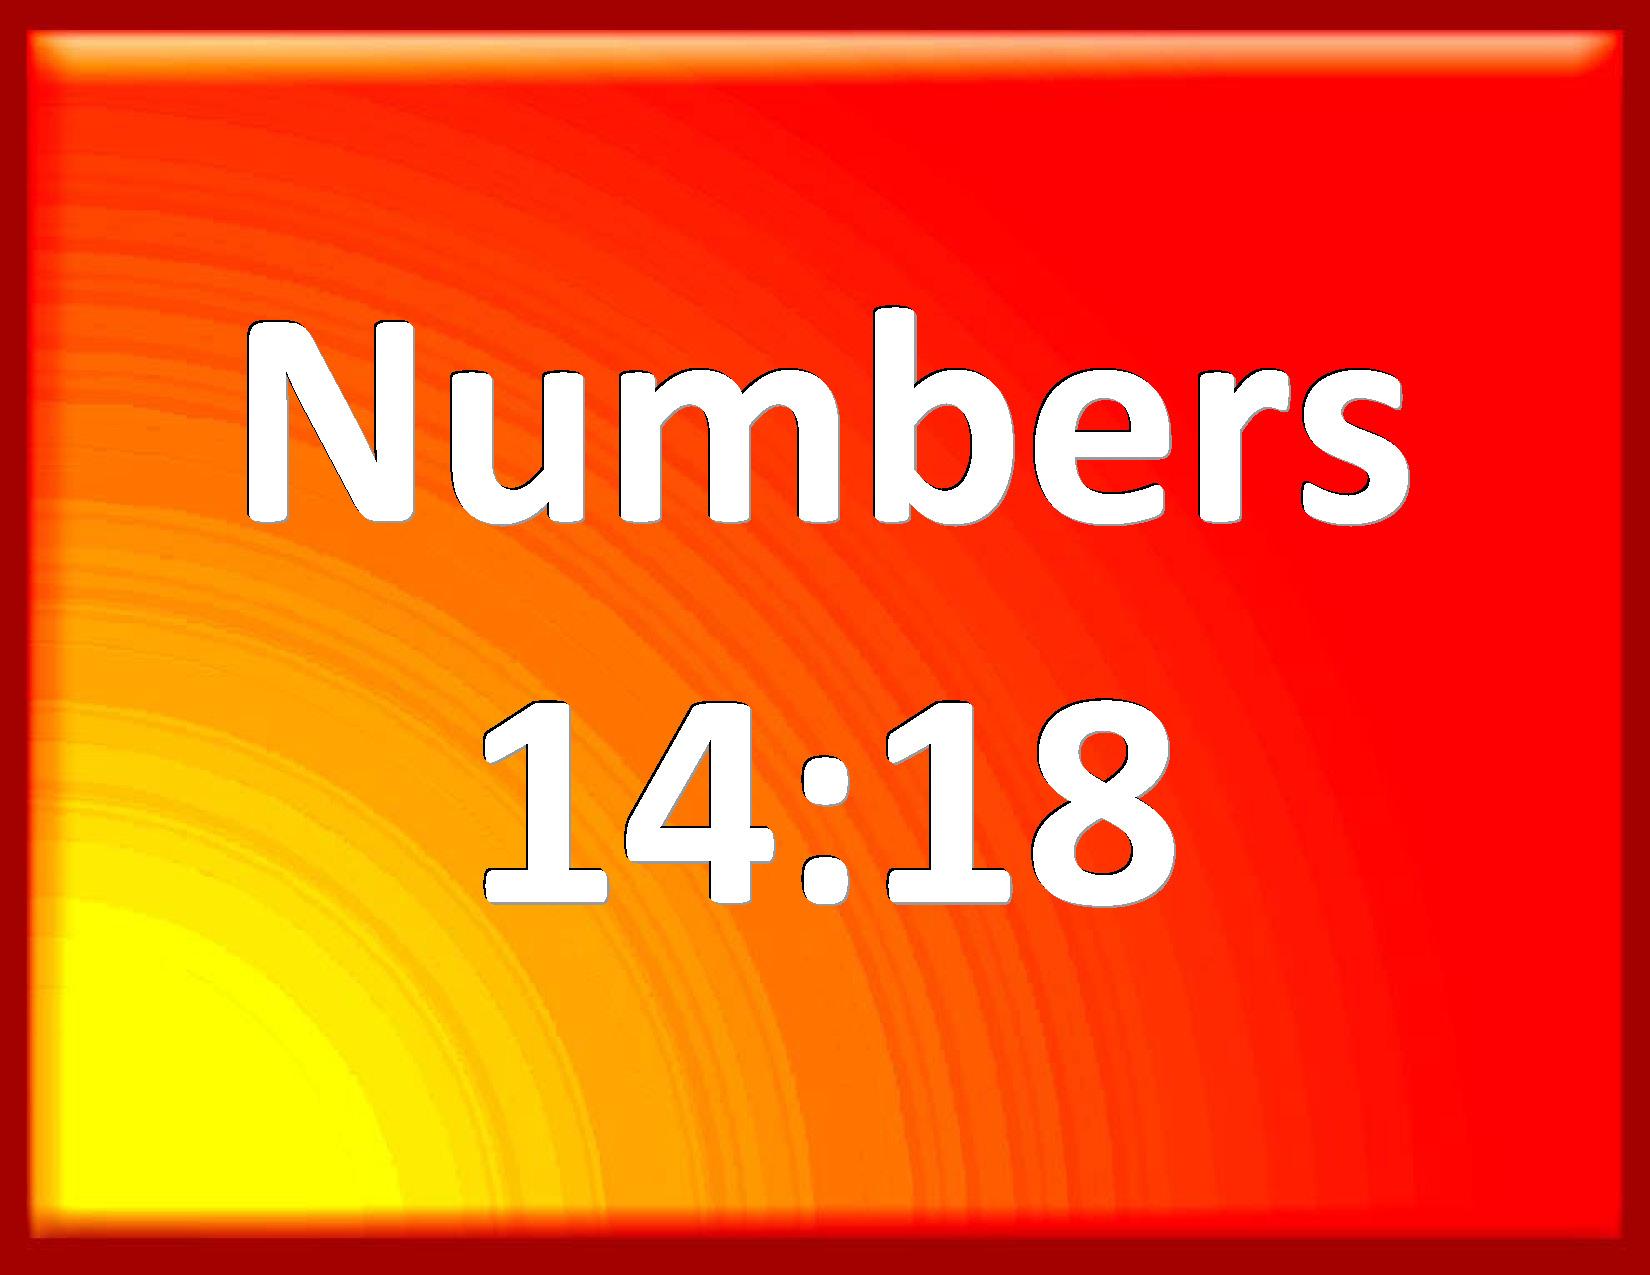 Bible Verse Romans 6 23